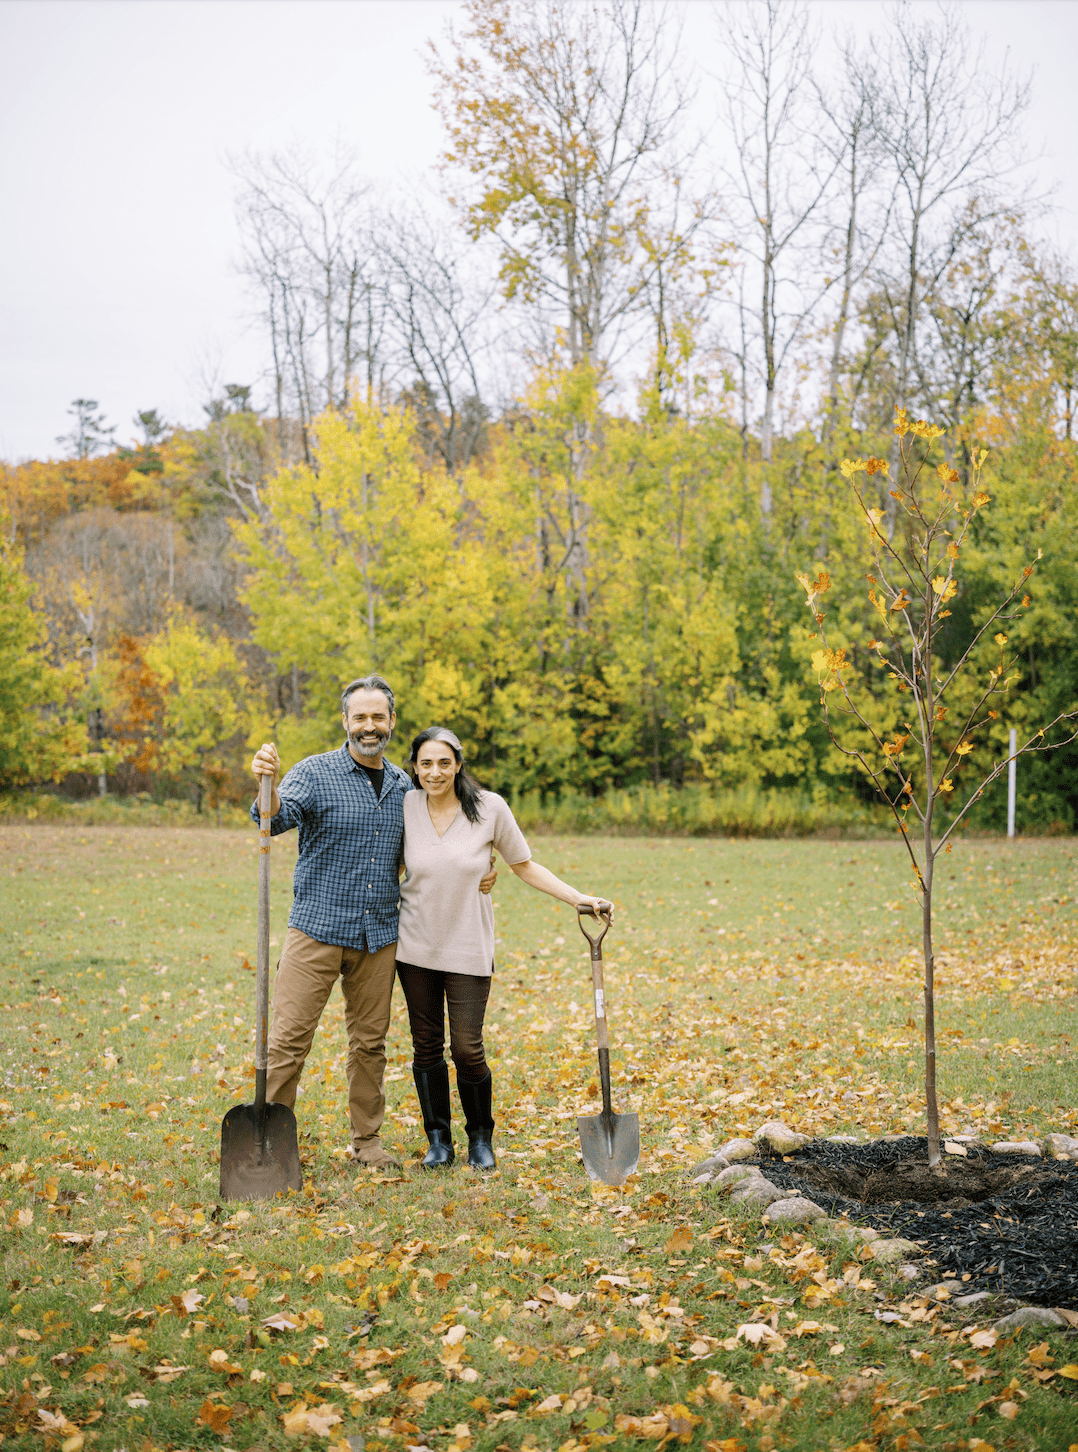 Couple planting a tree